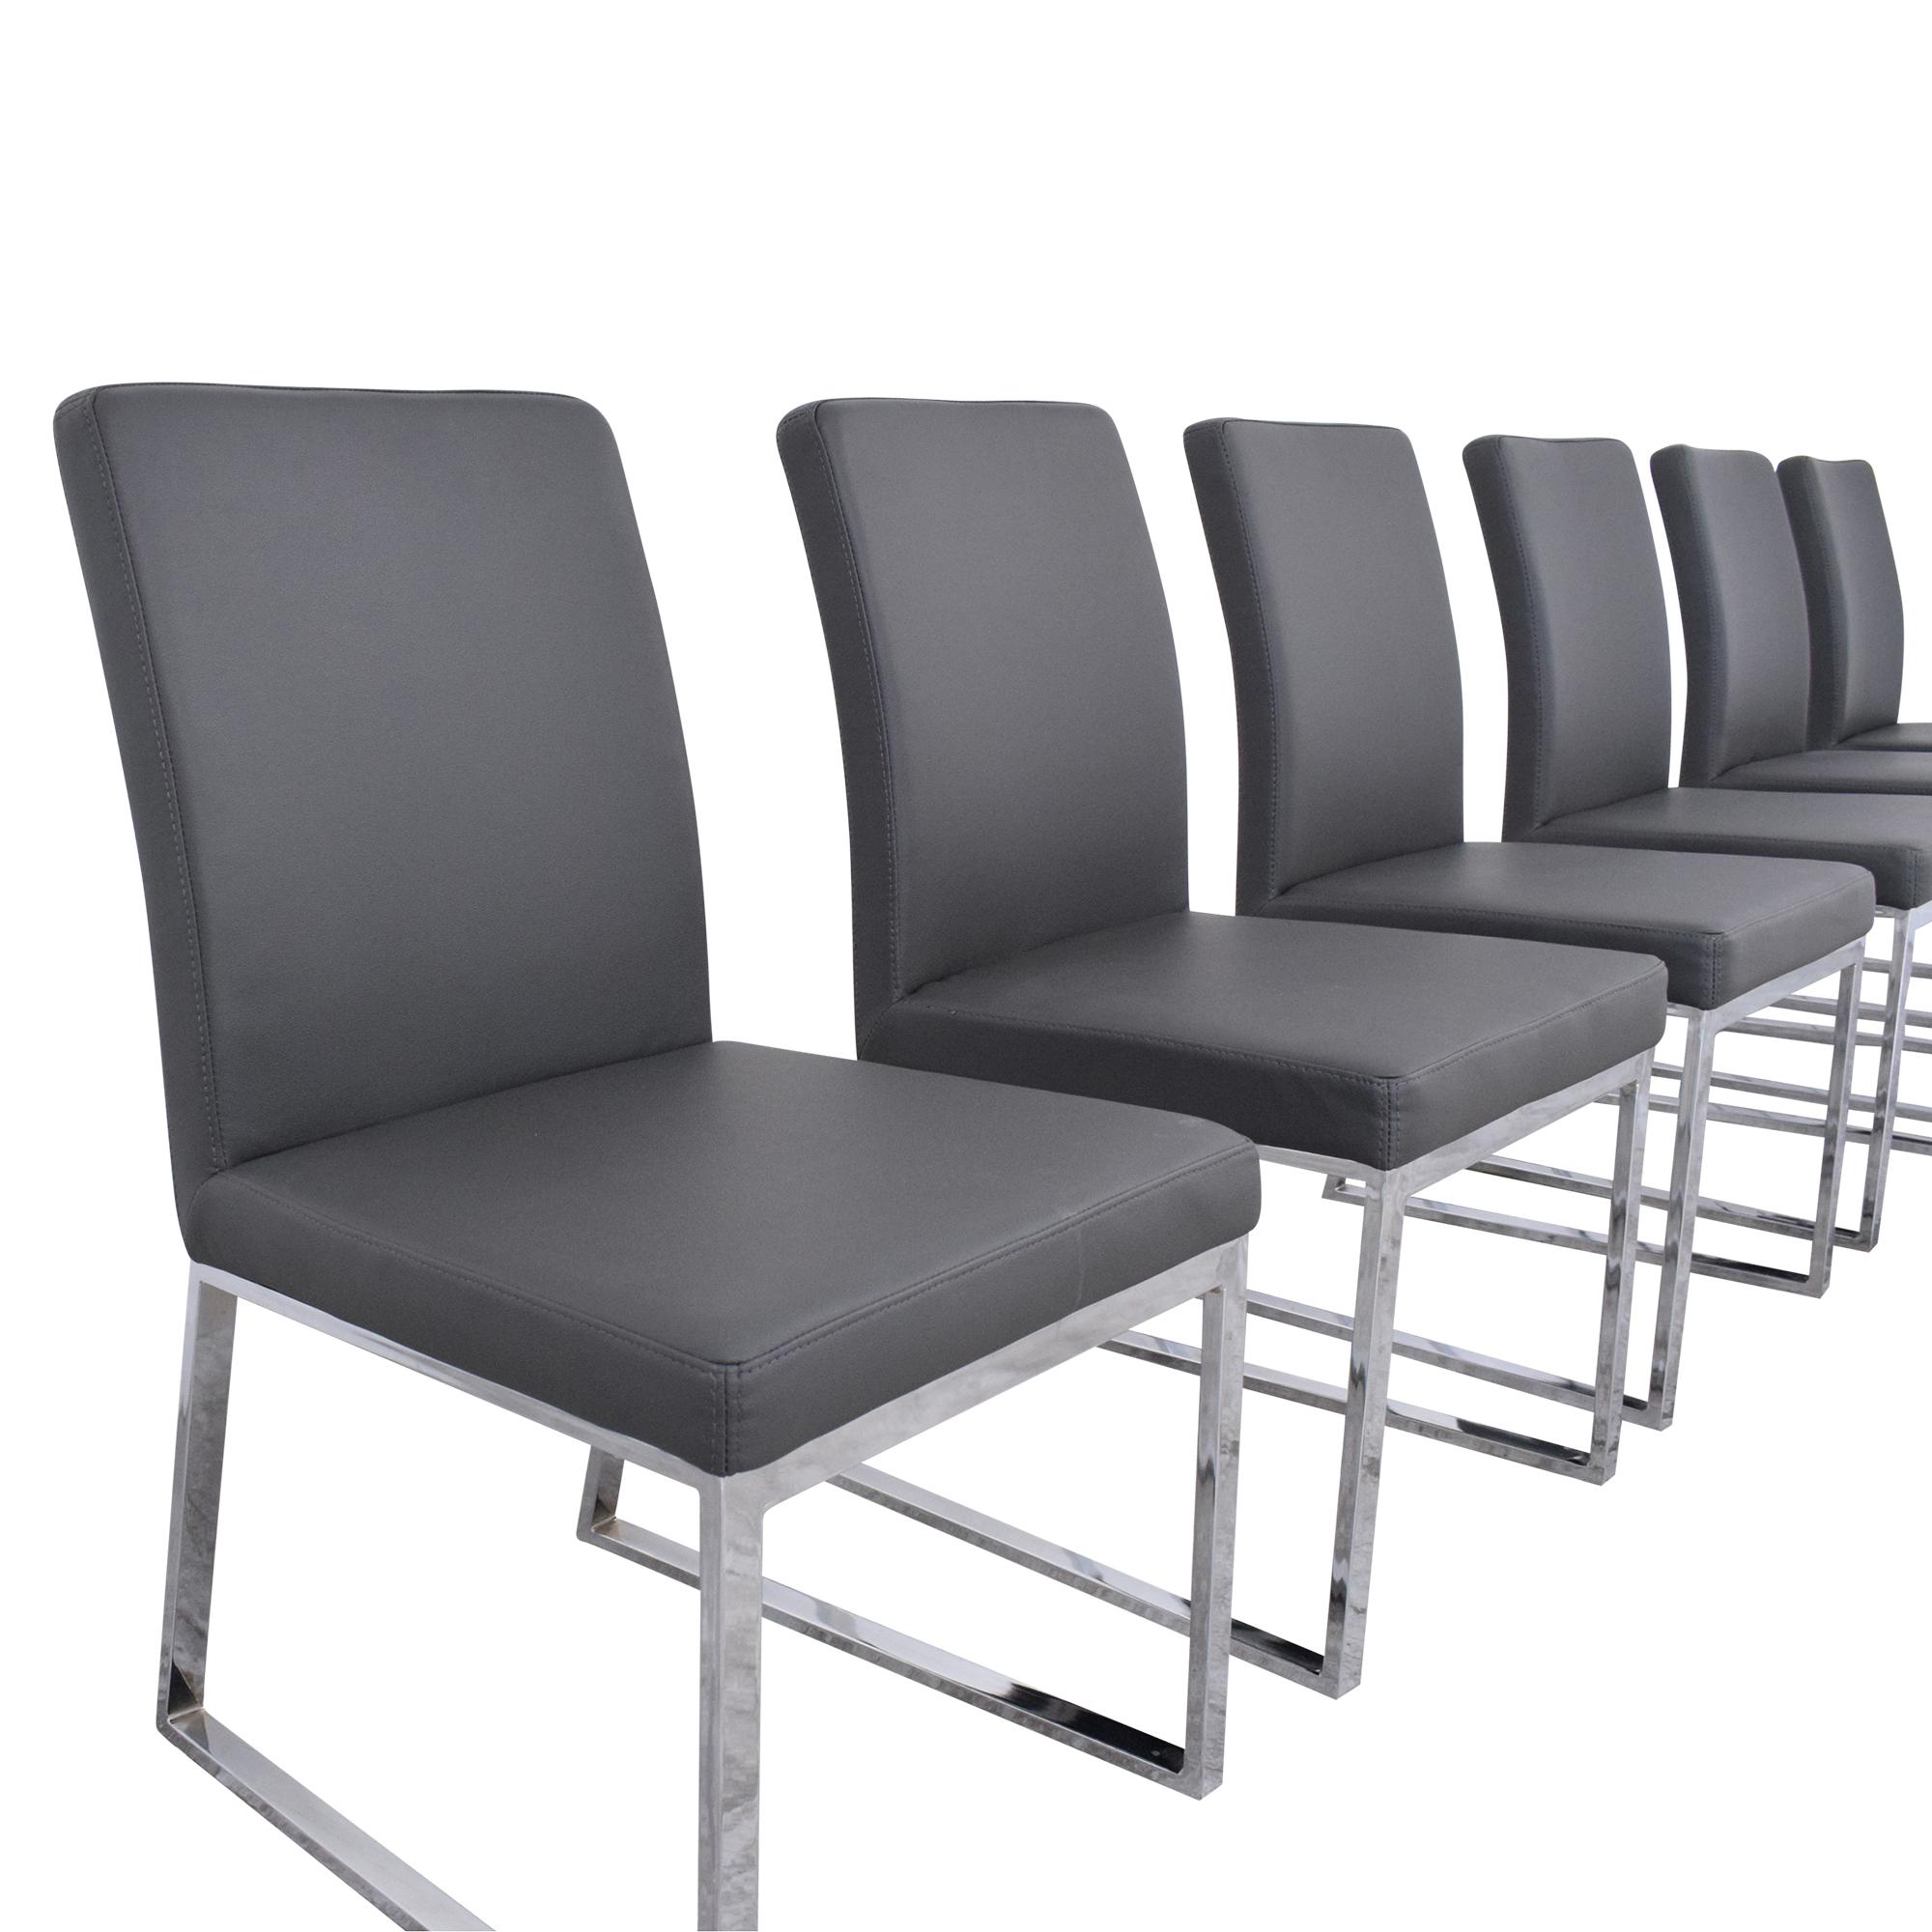 Modani Modani Niero Dining Chairs coupon